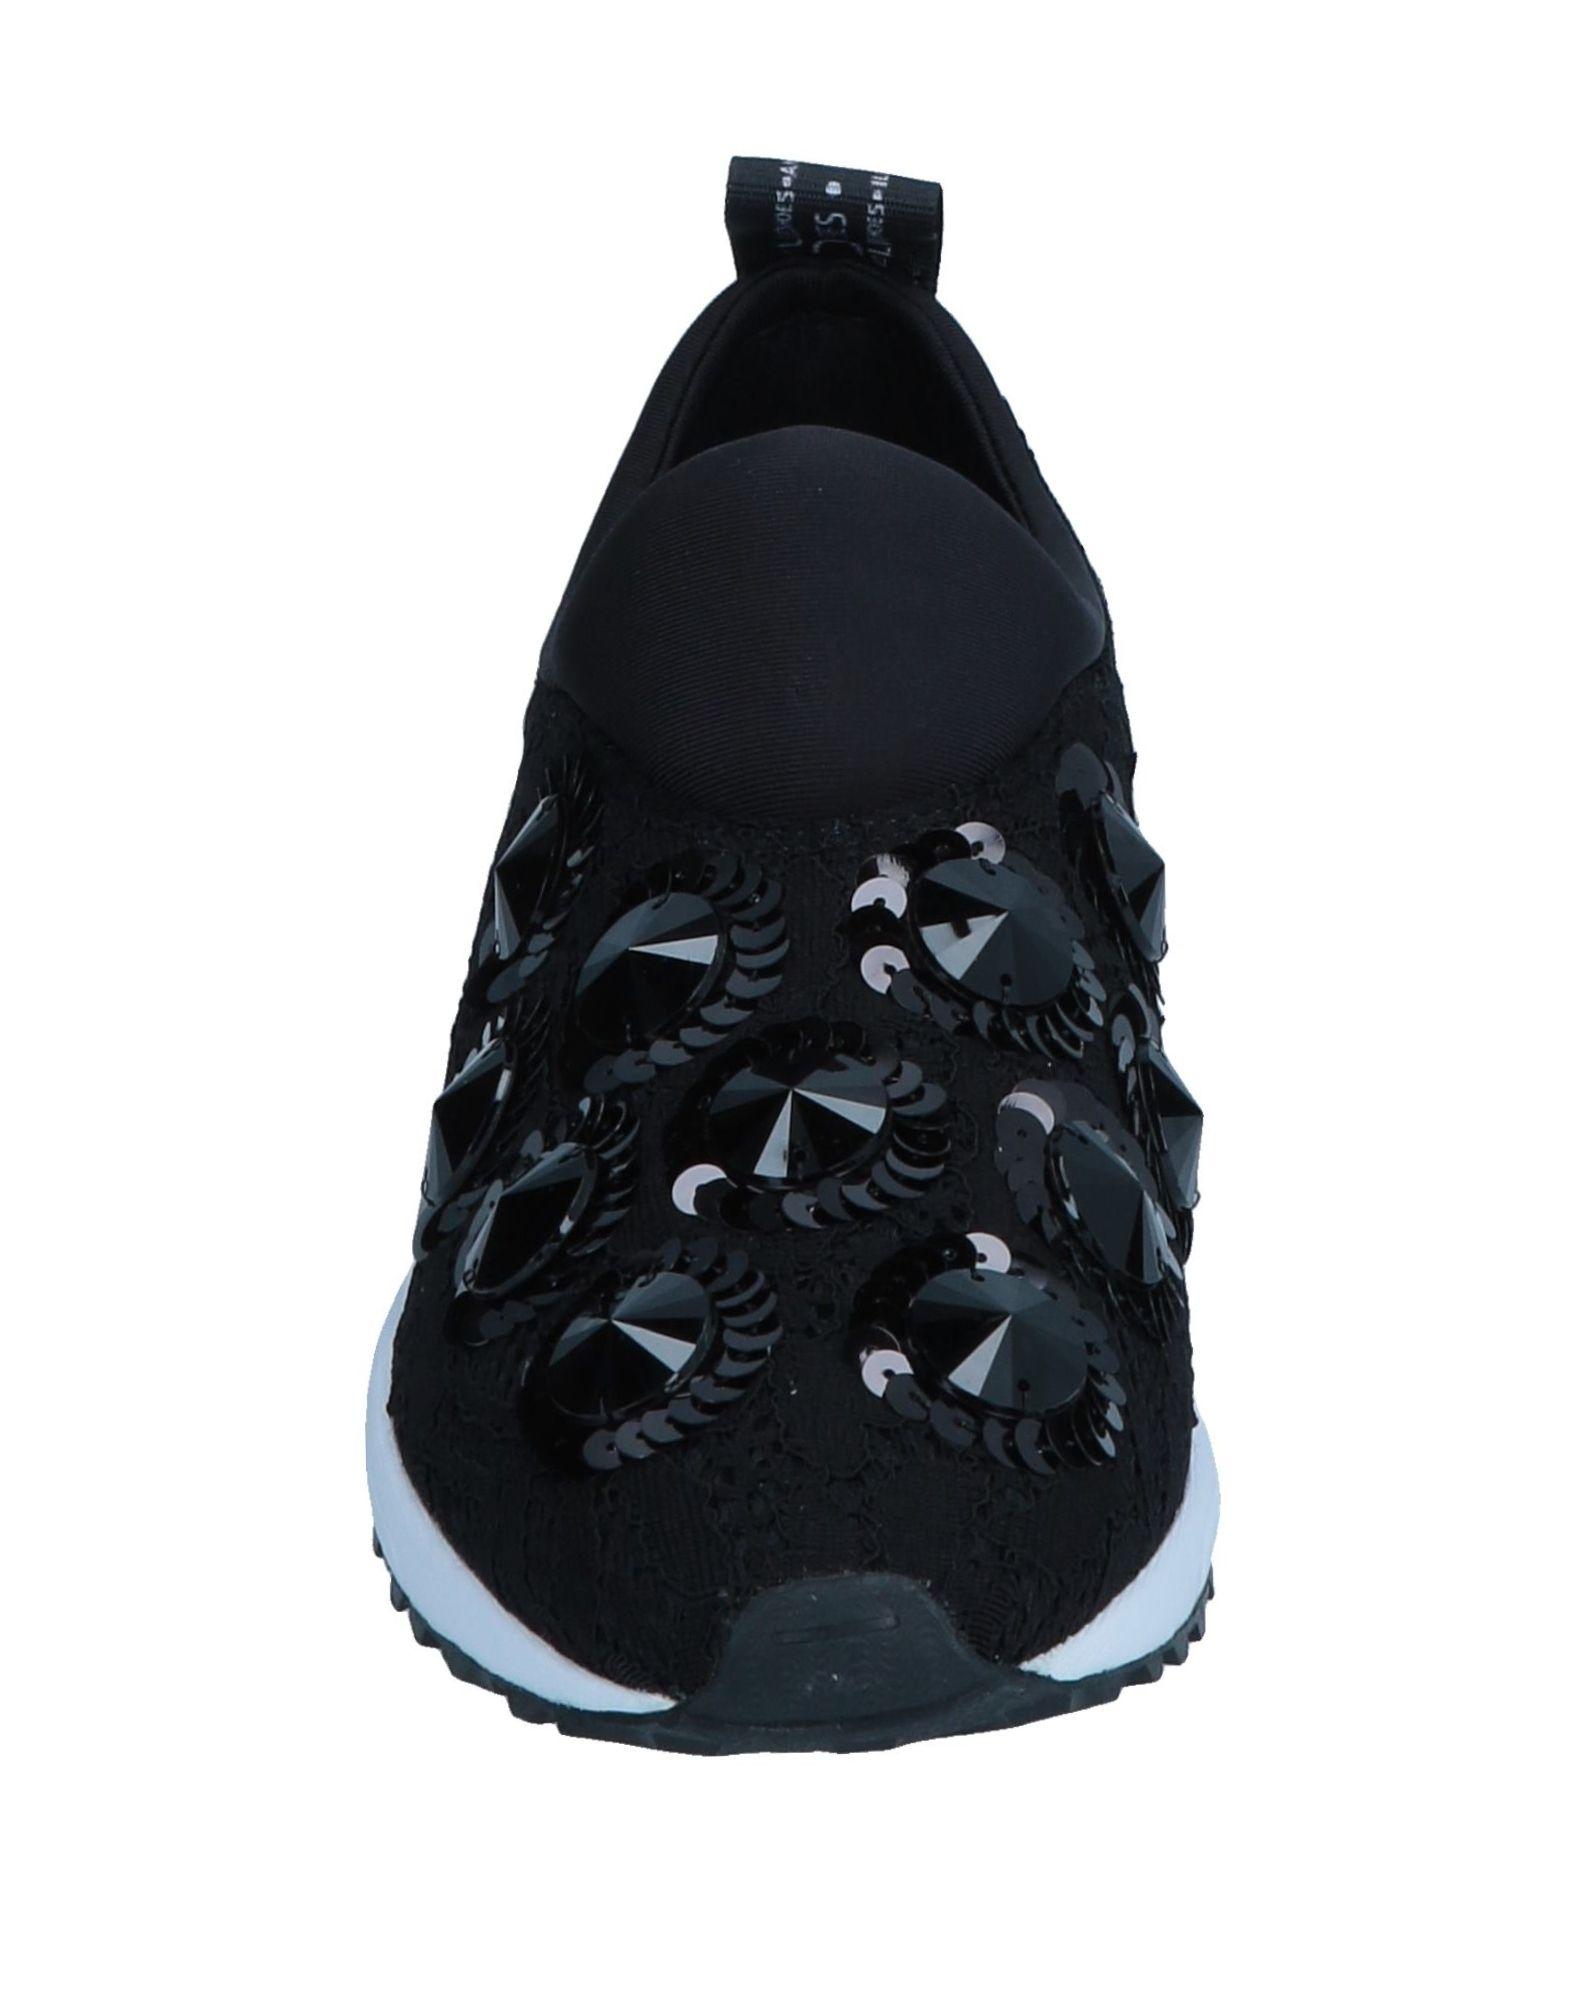 Liu •Jo Shoes beliebte Sneakers Damen  11547303JK Gute Qualität beliebte Shoes Schuhe 4217f1